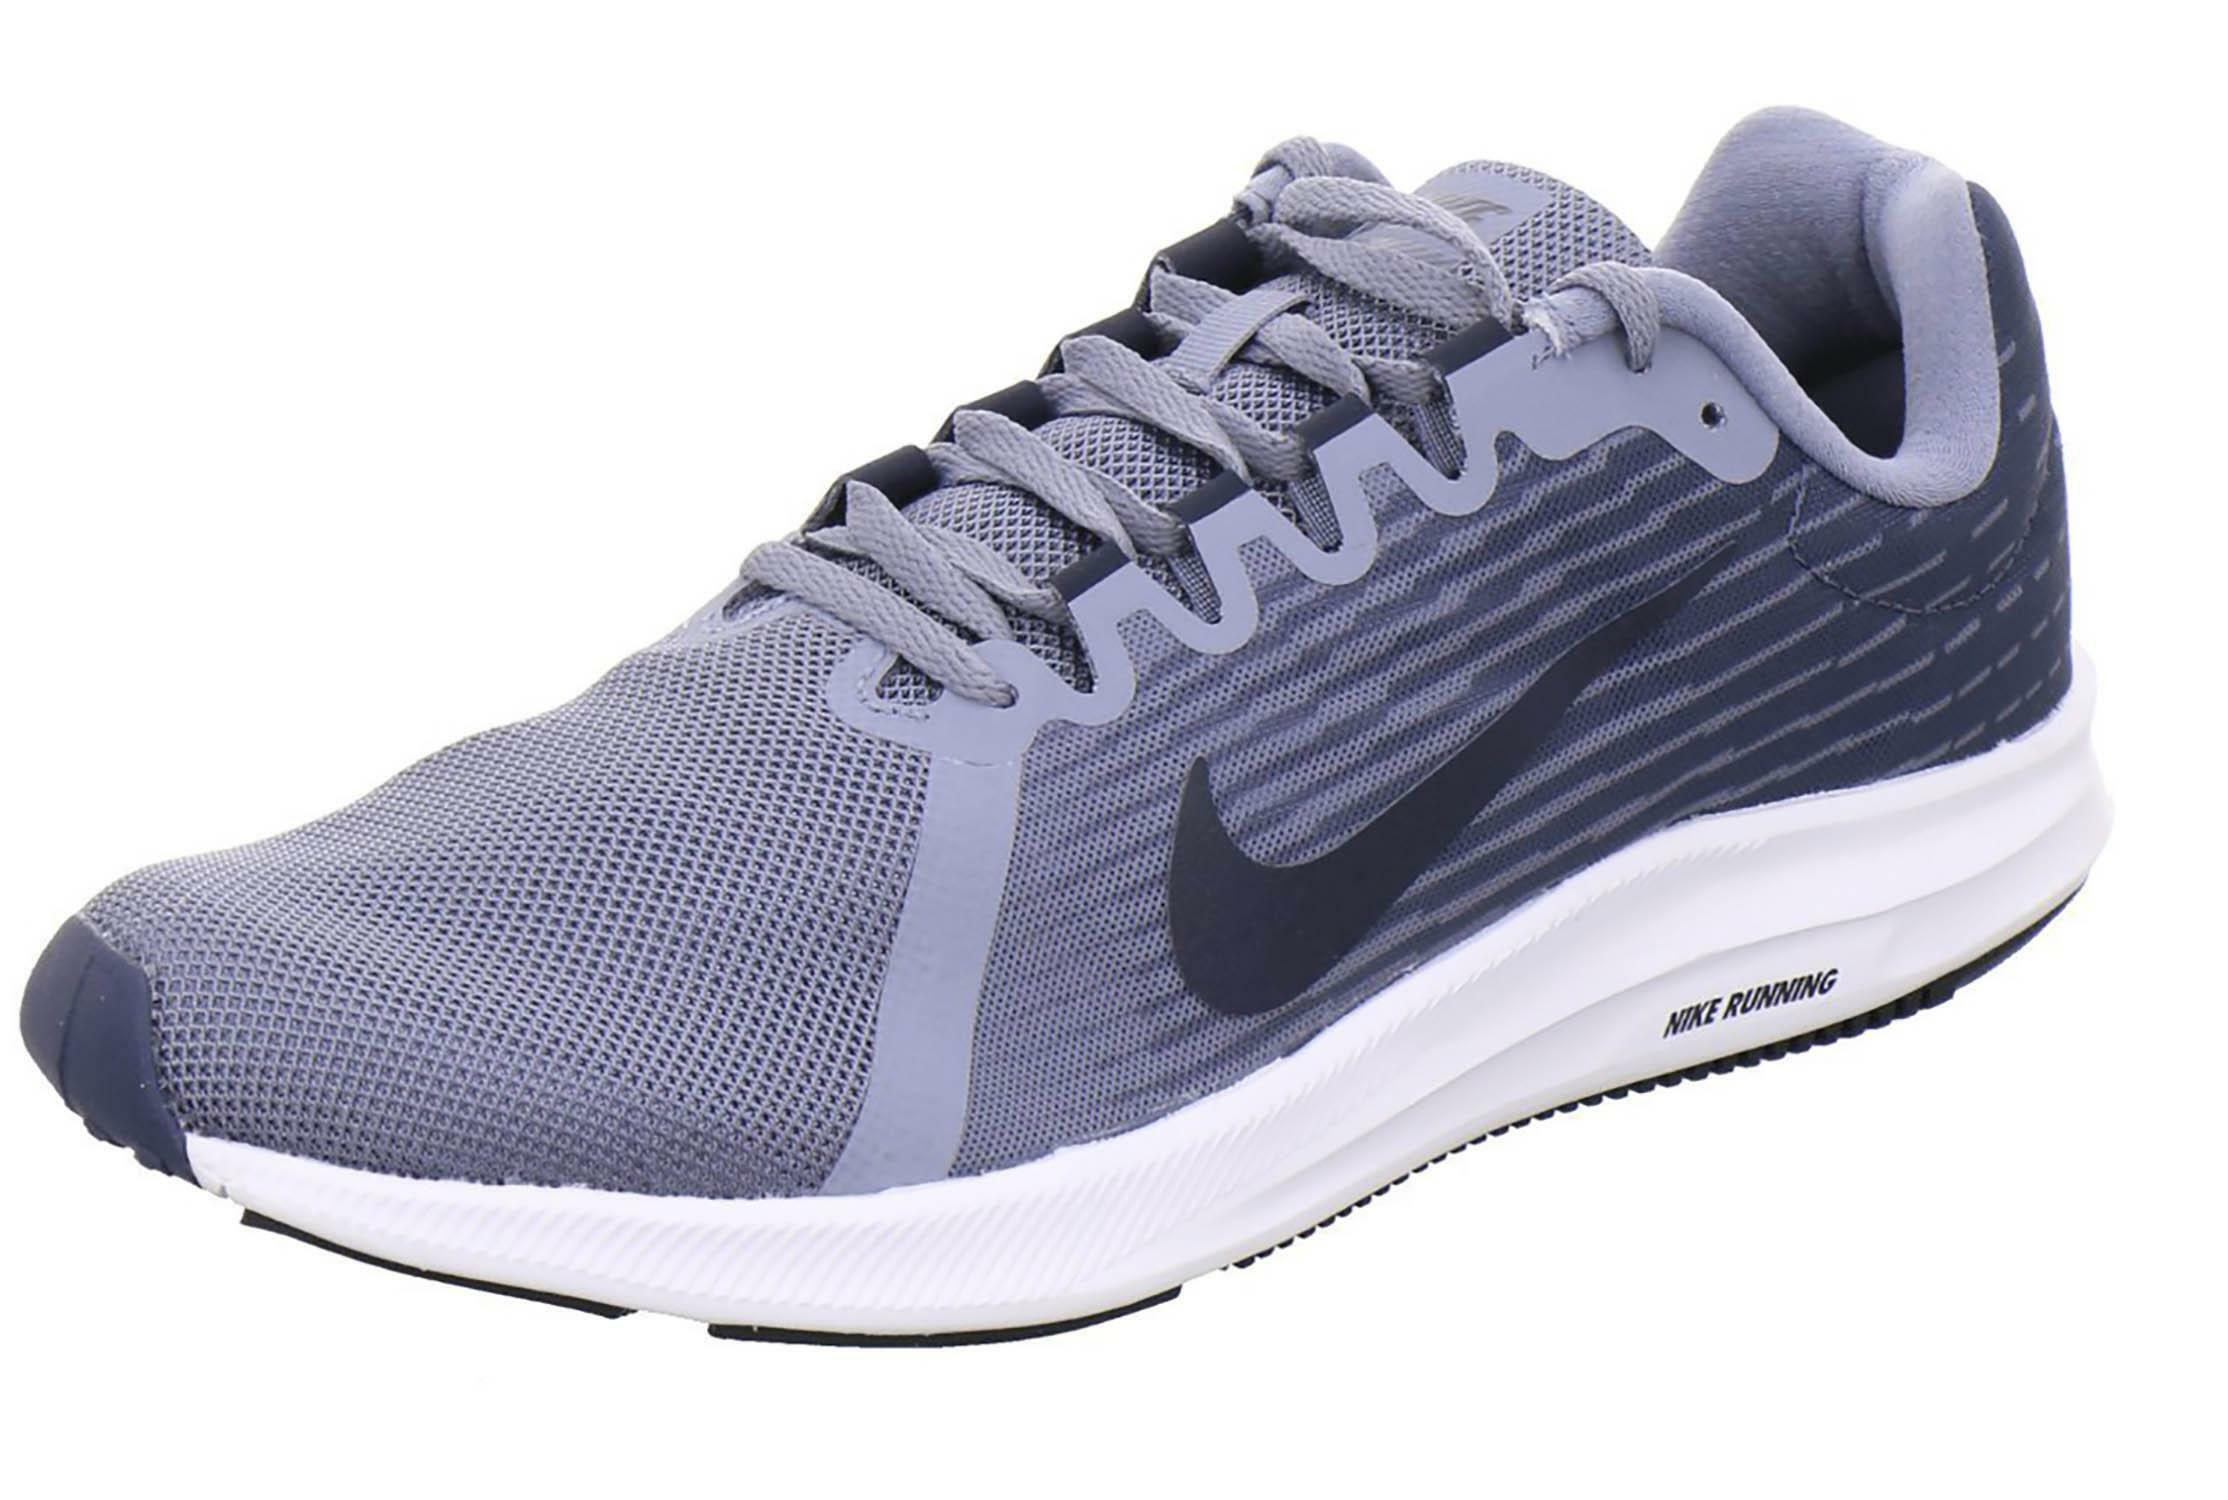 913cefadcf DownShifter Sports zapatos Hombres gris 908984402 NIKE 8 nndrwl147- Zapatillas deportivas